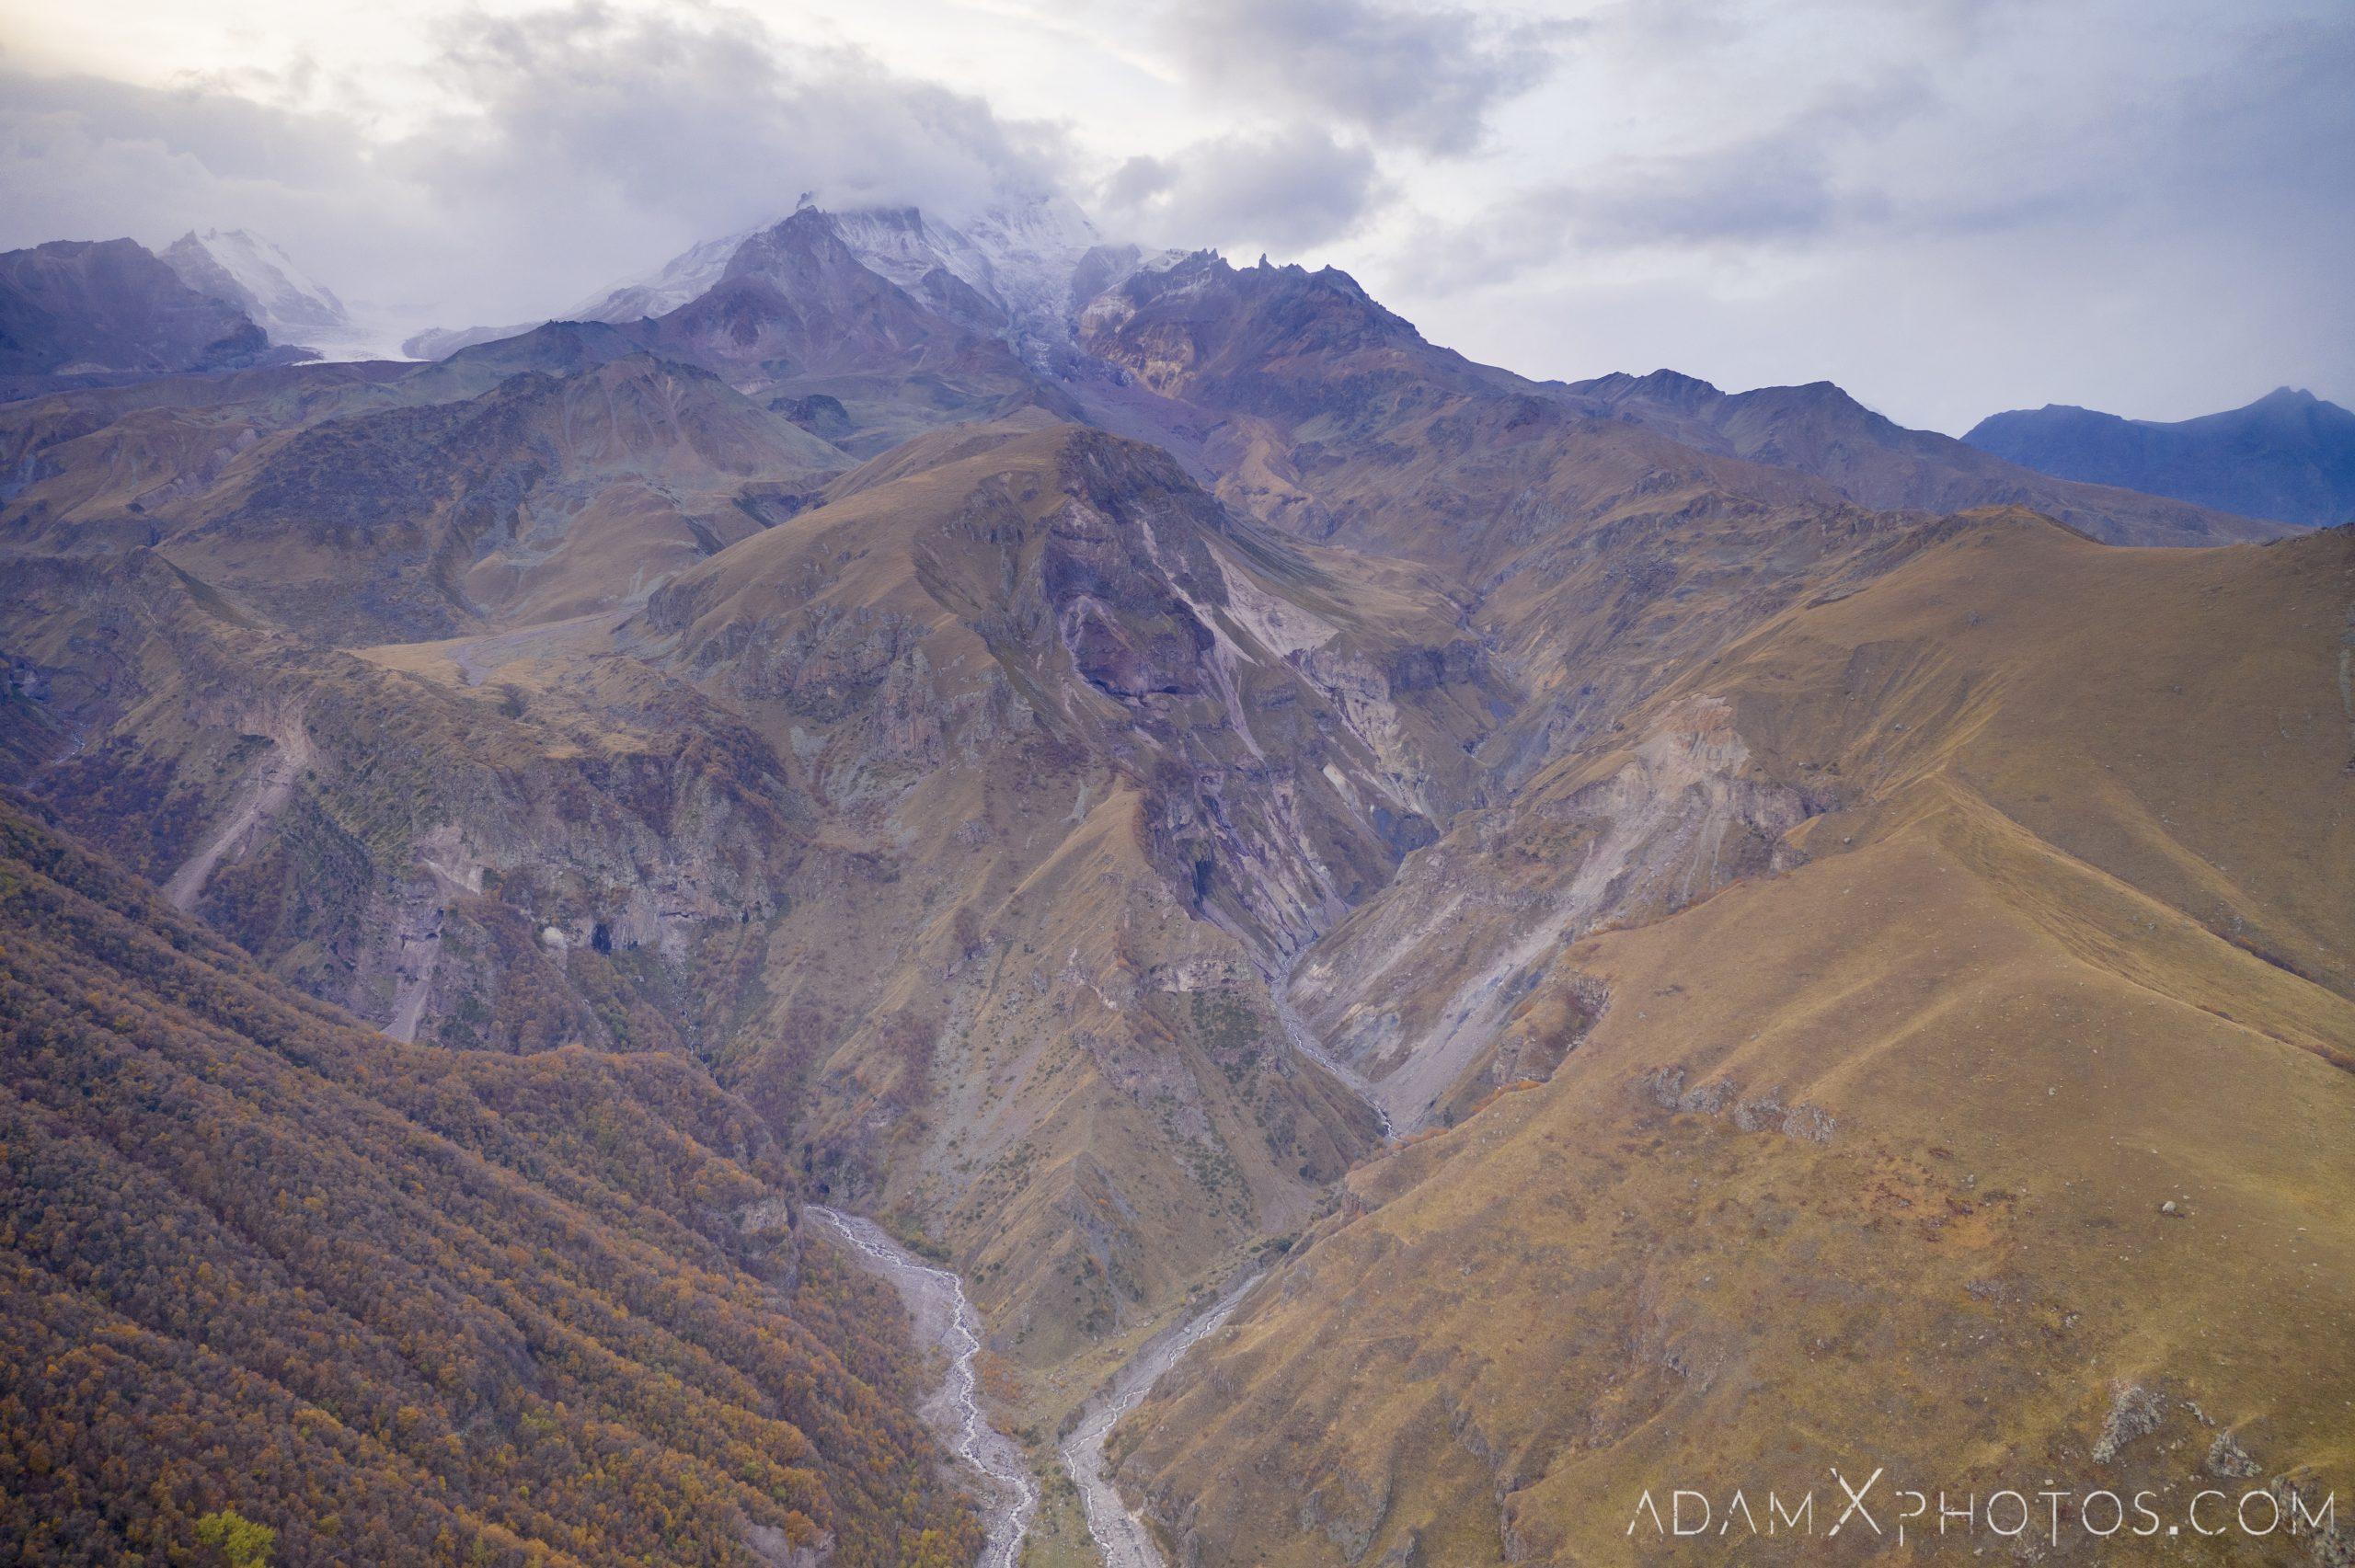 Gergeti Mountains Drone Kazbek Georgia Adam X AdamXPhotos Urbex Urban Exploration 2018 Abandoned ruins lost forgotten derelict location